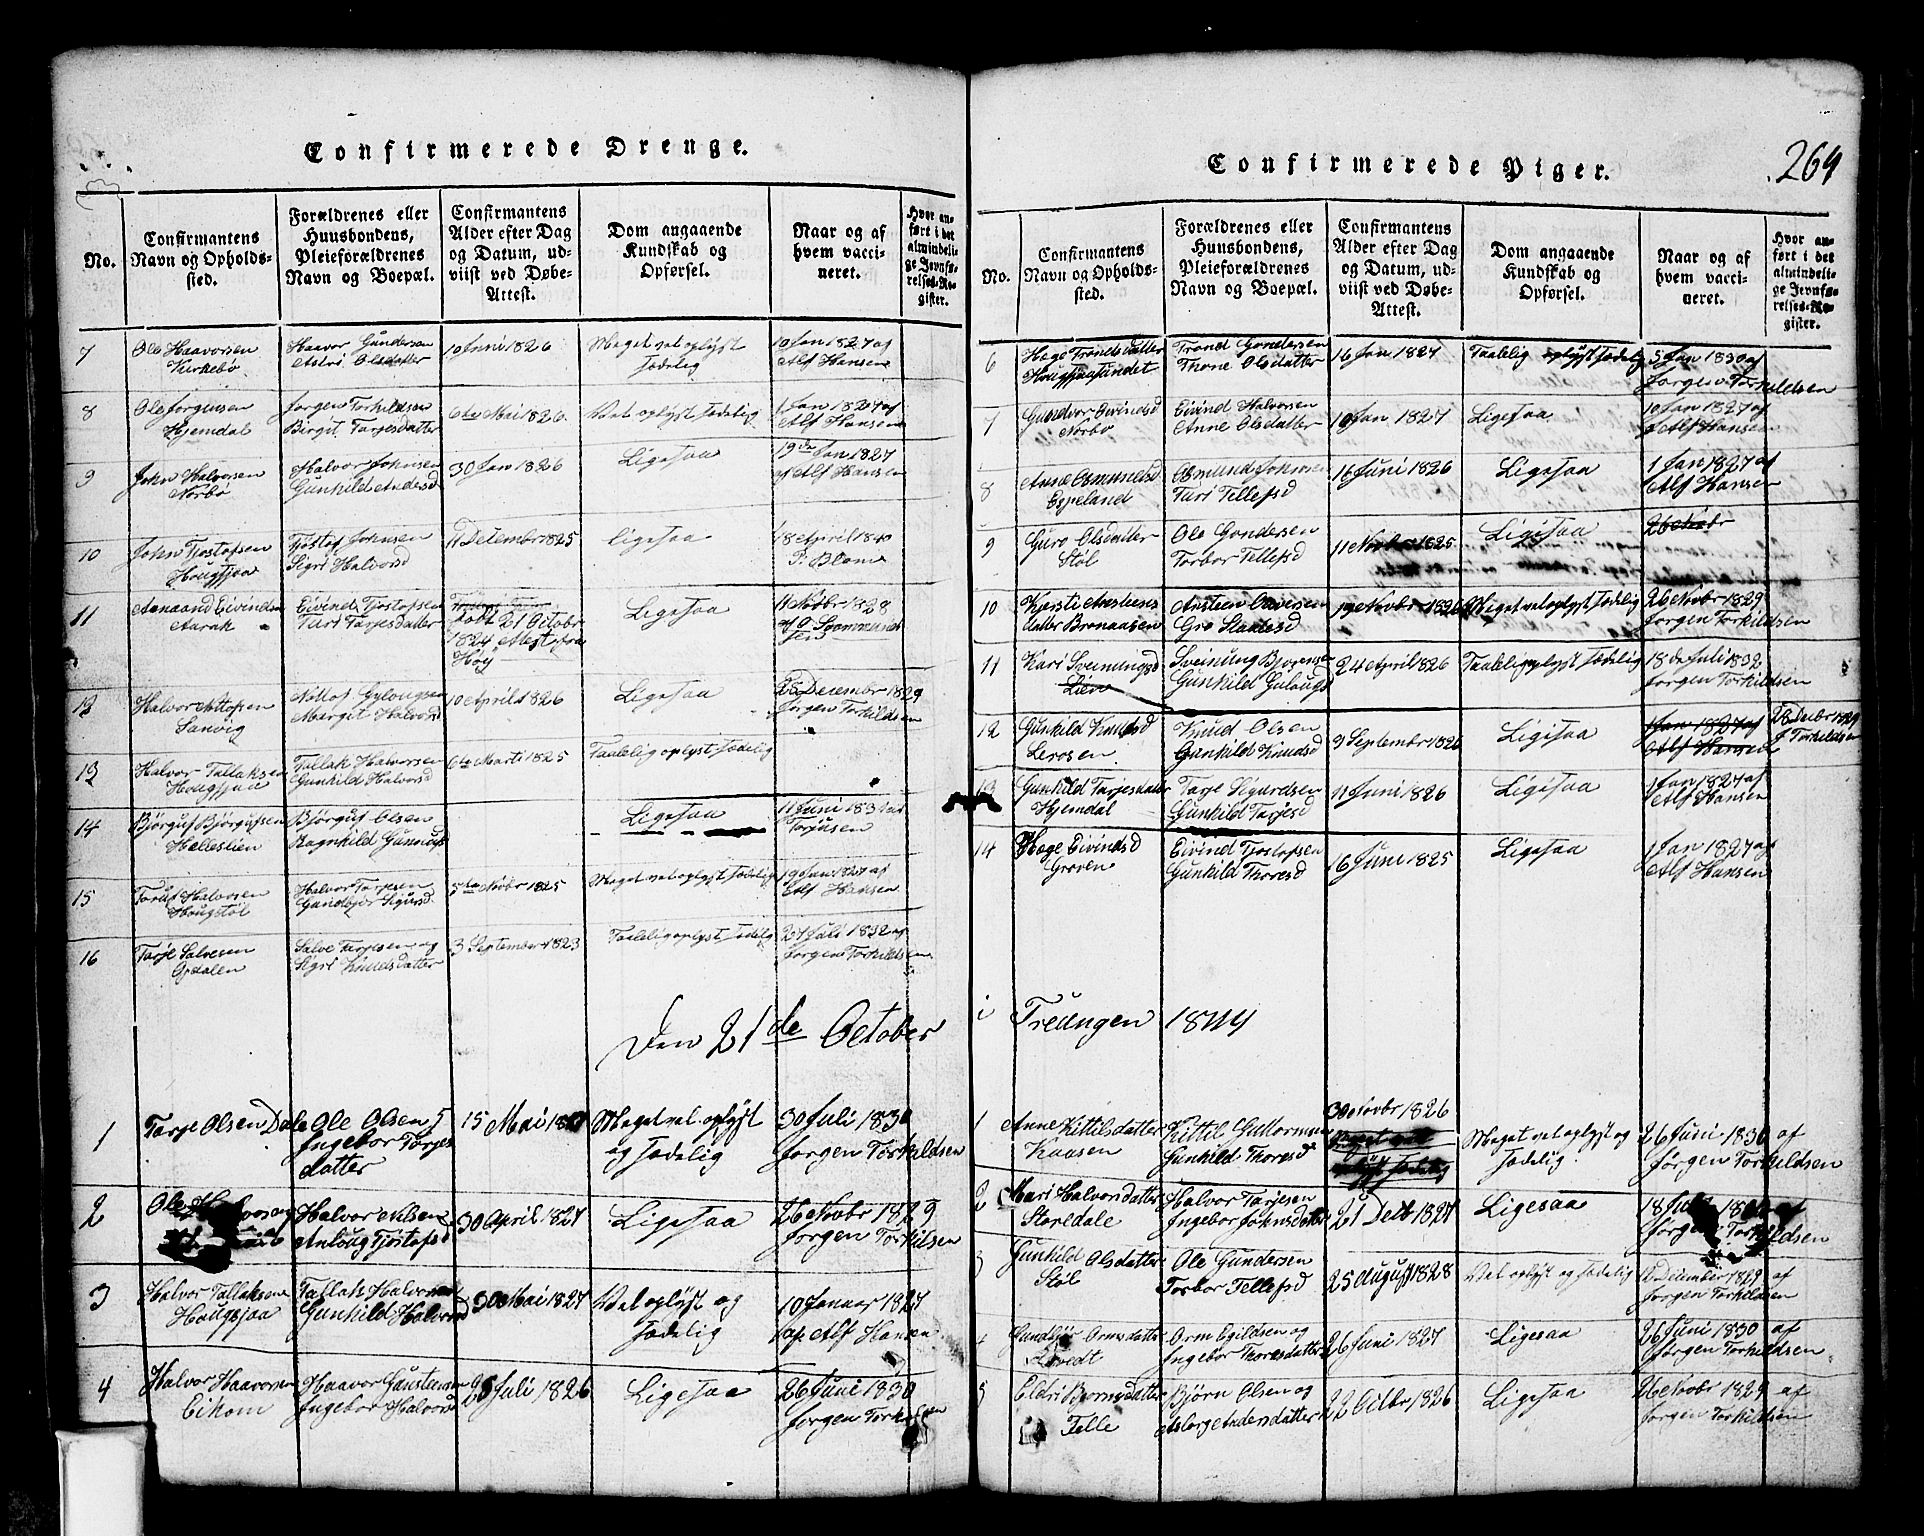 SAKO, Nissedal kirkebøker, G/Gb/L0001: Klokkerbok nr. II 1, 1814-1862, s. 264